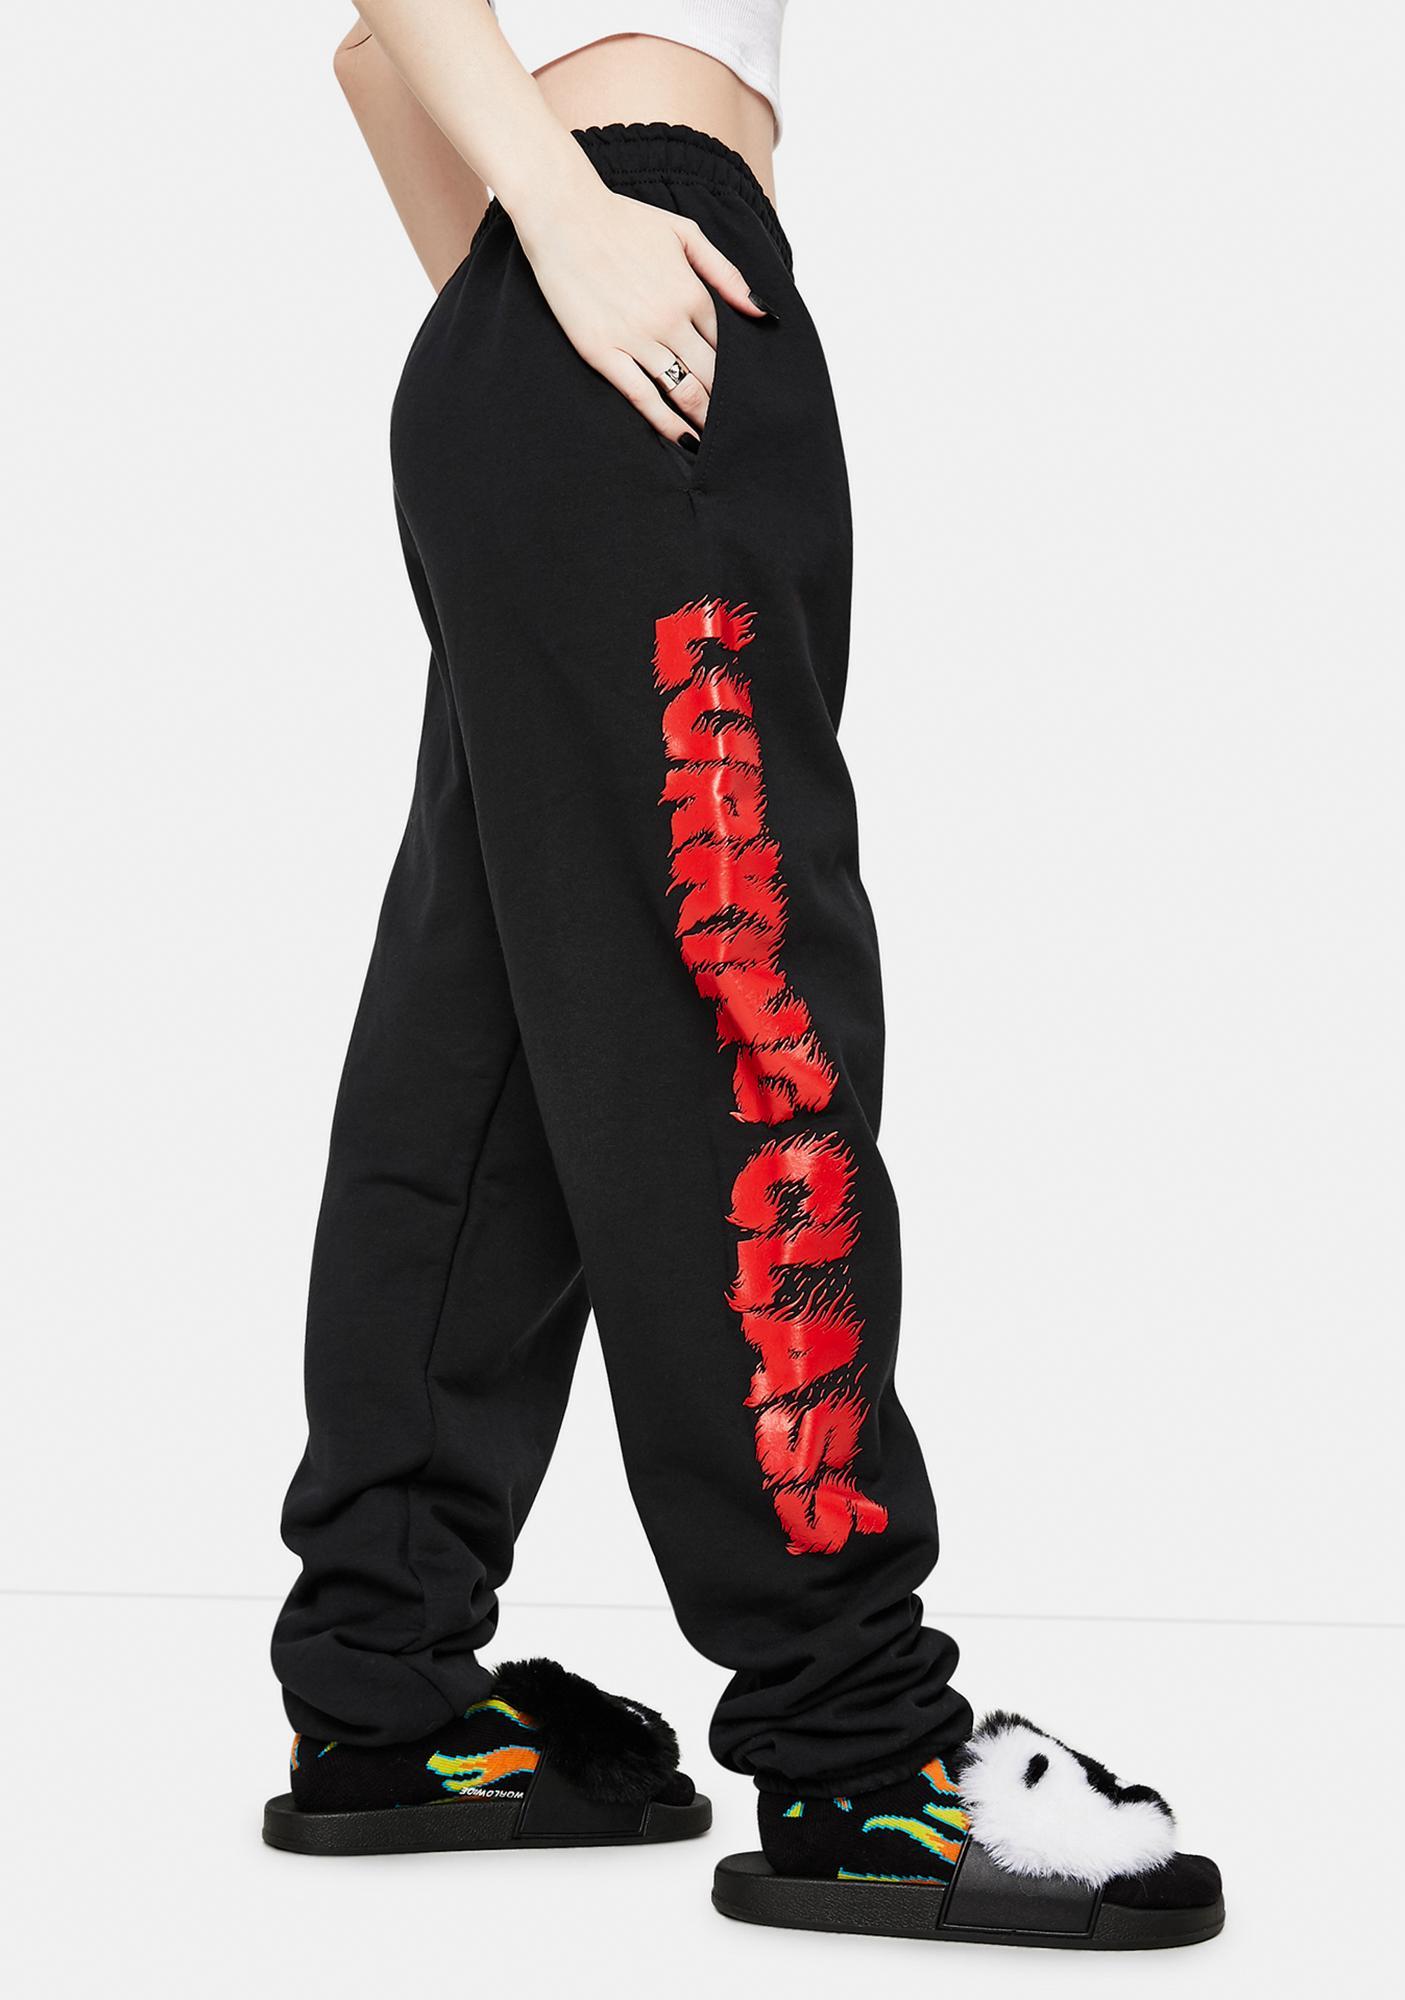 Lurking Class K9 Sweatpants